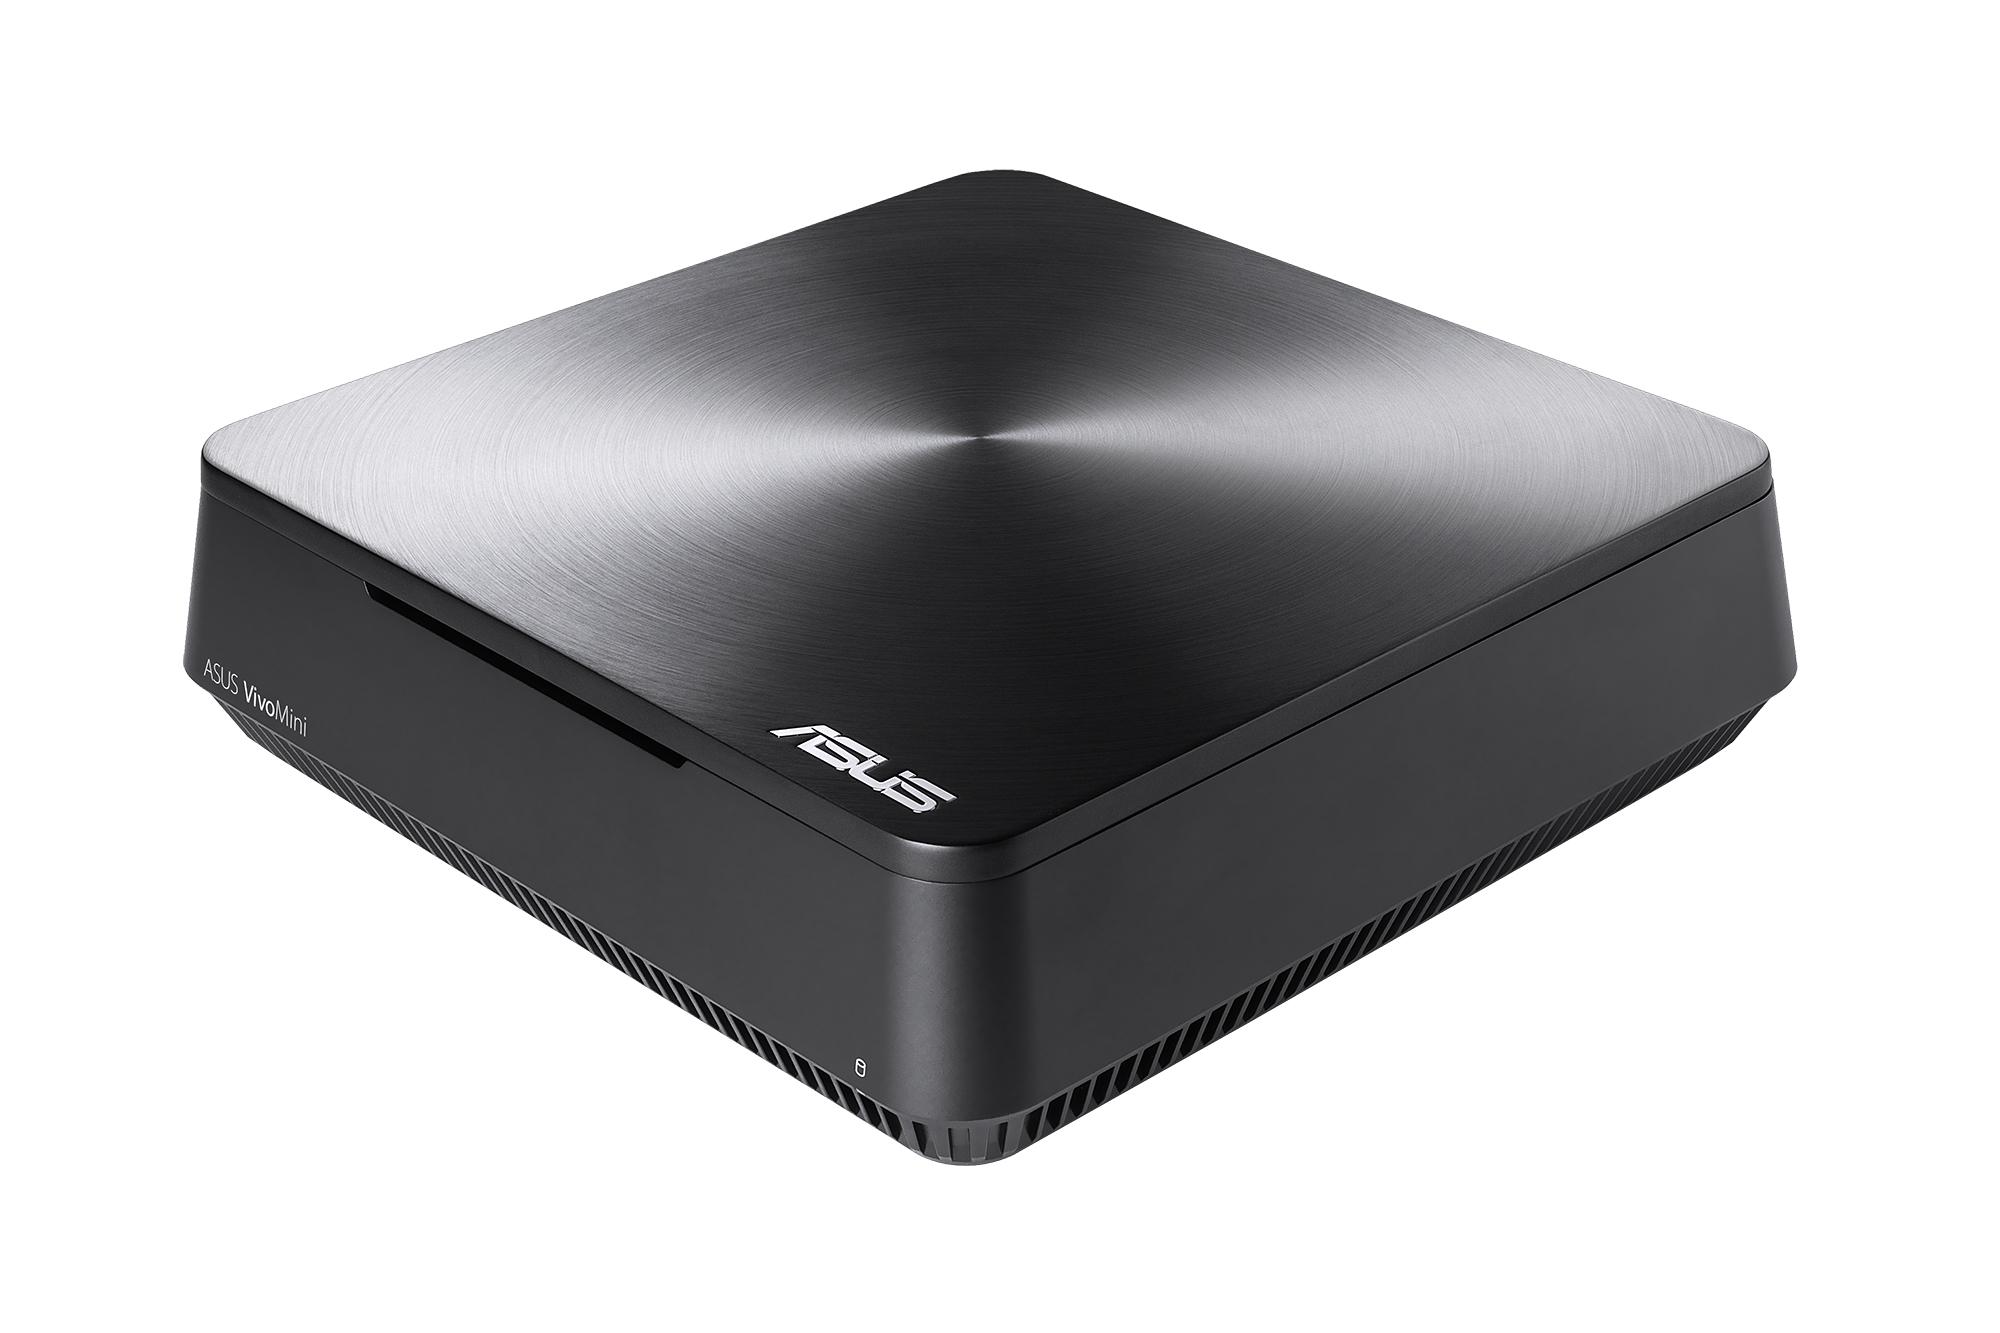 ASUS VivoMini VM65 7100U/128GBssd/4GB/bez OS